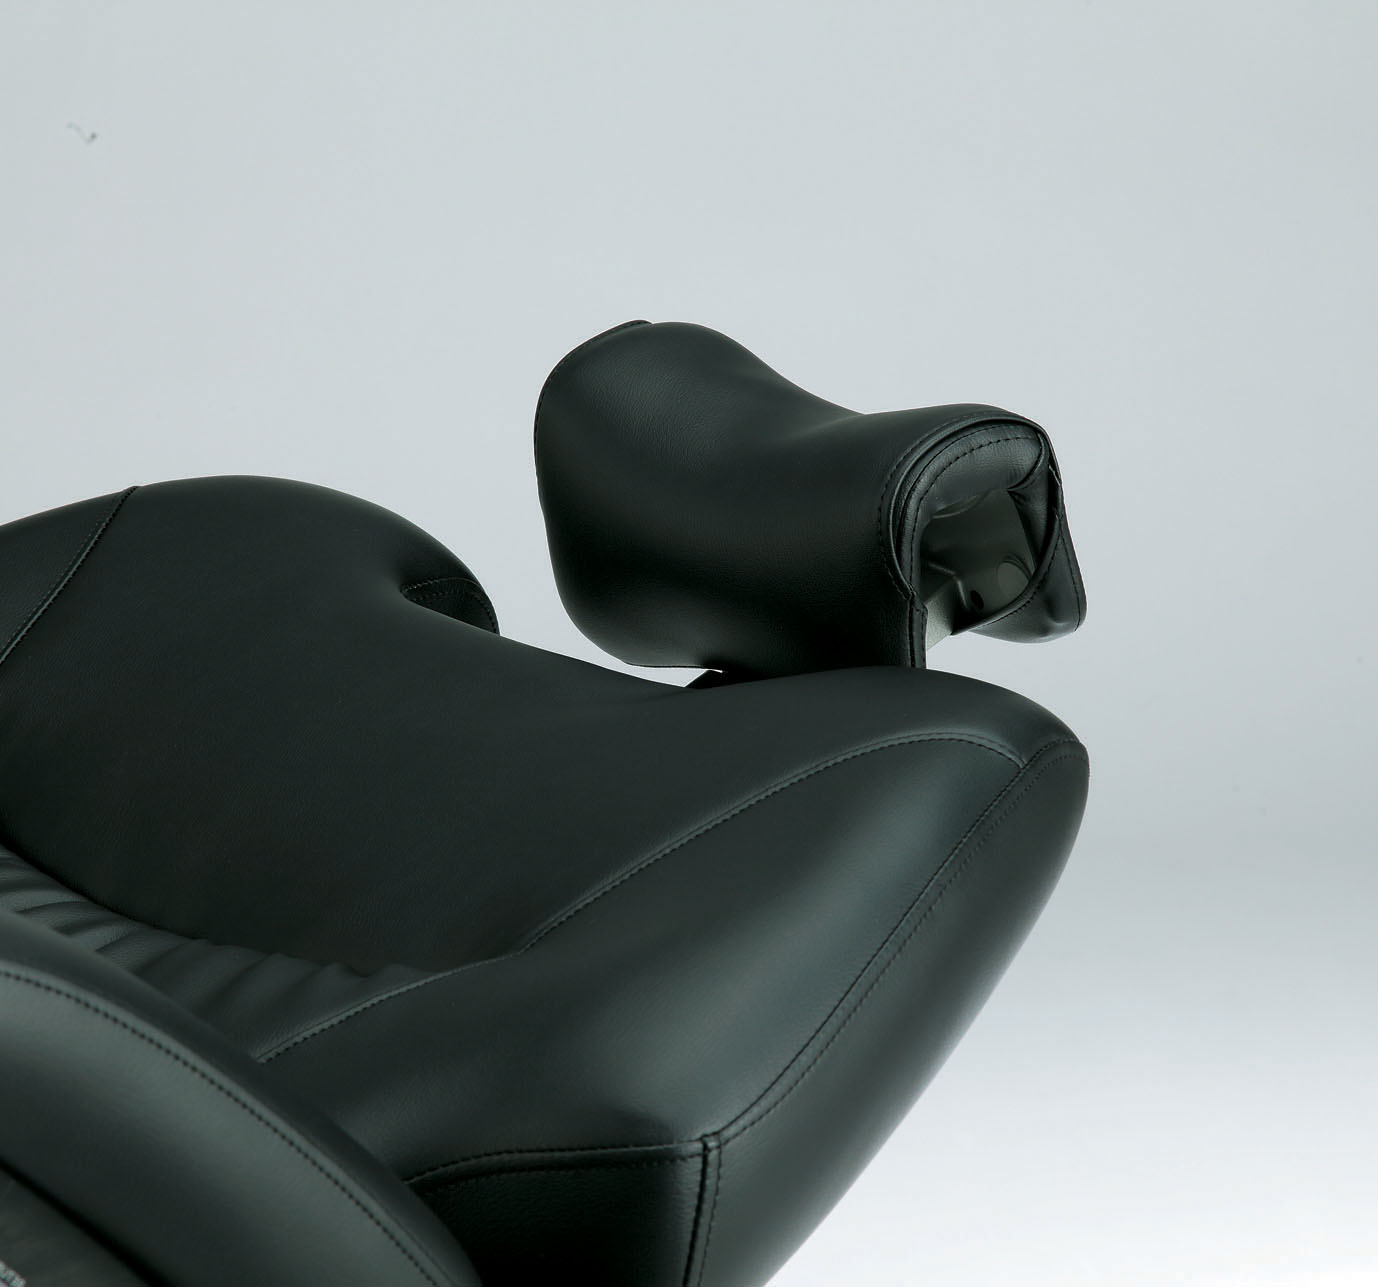 Rotate the Legends headrest 90 degrees.